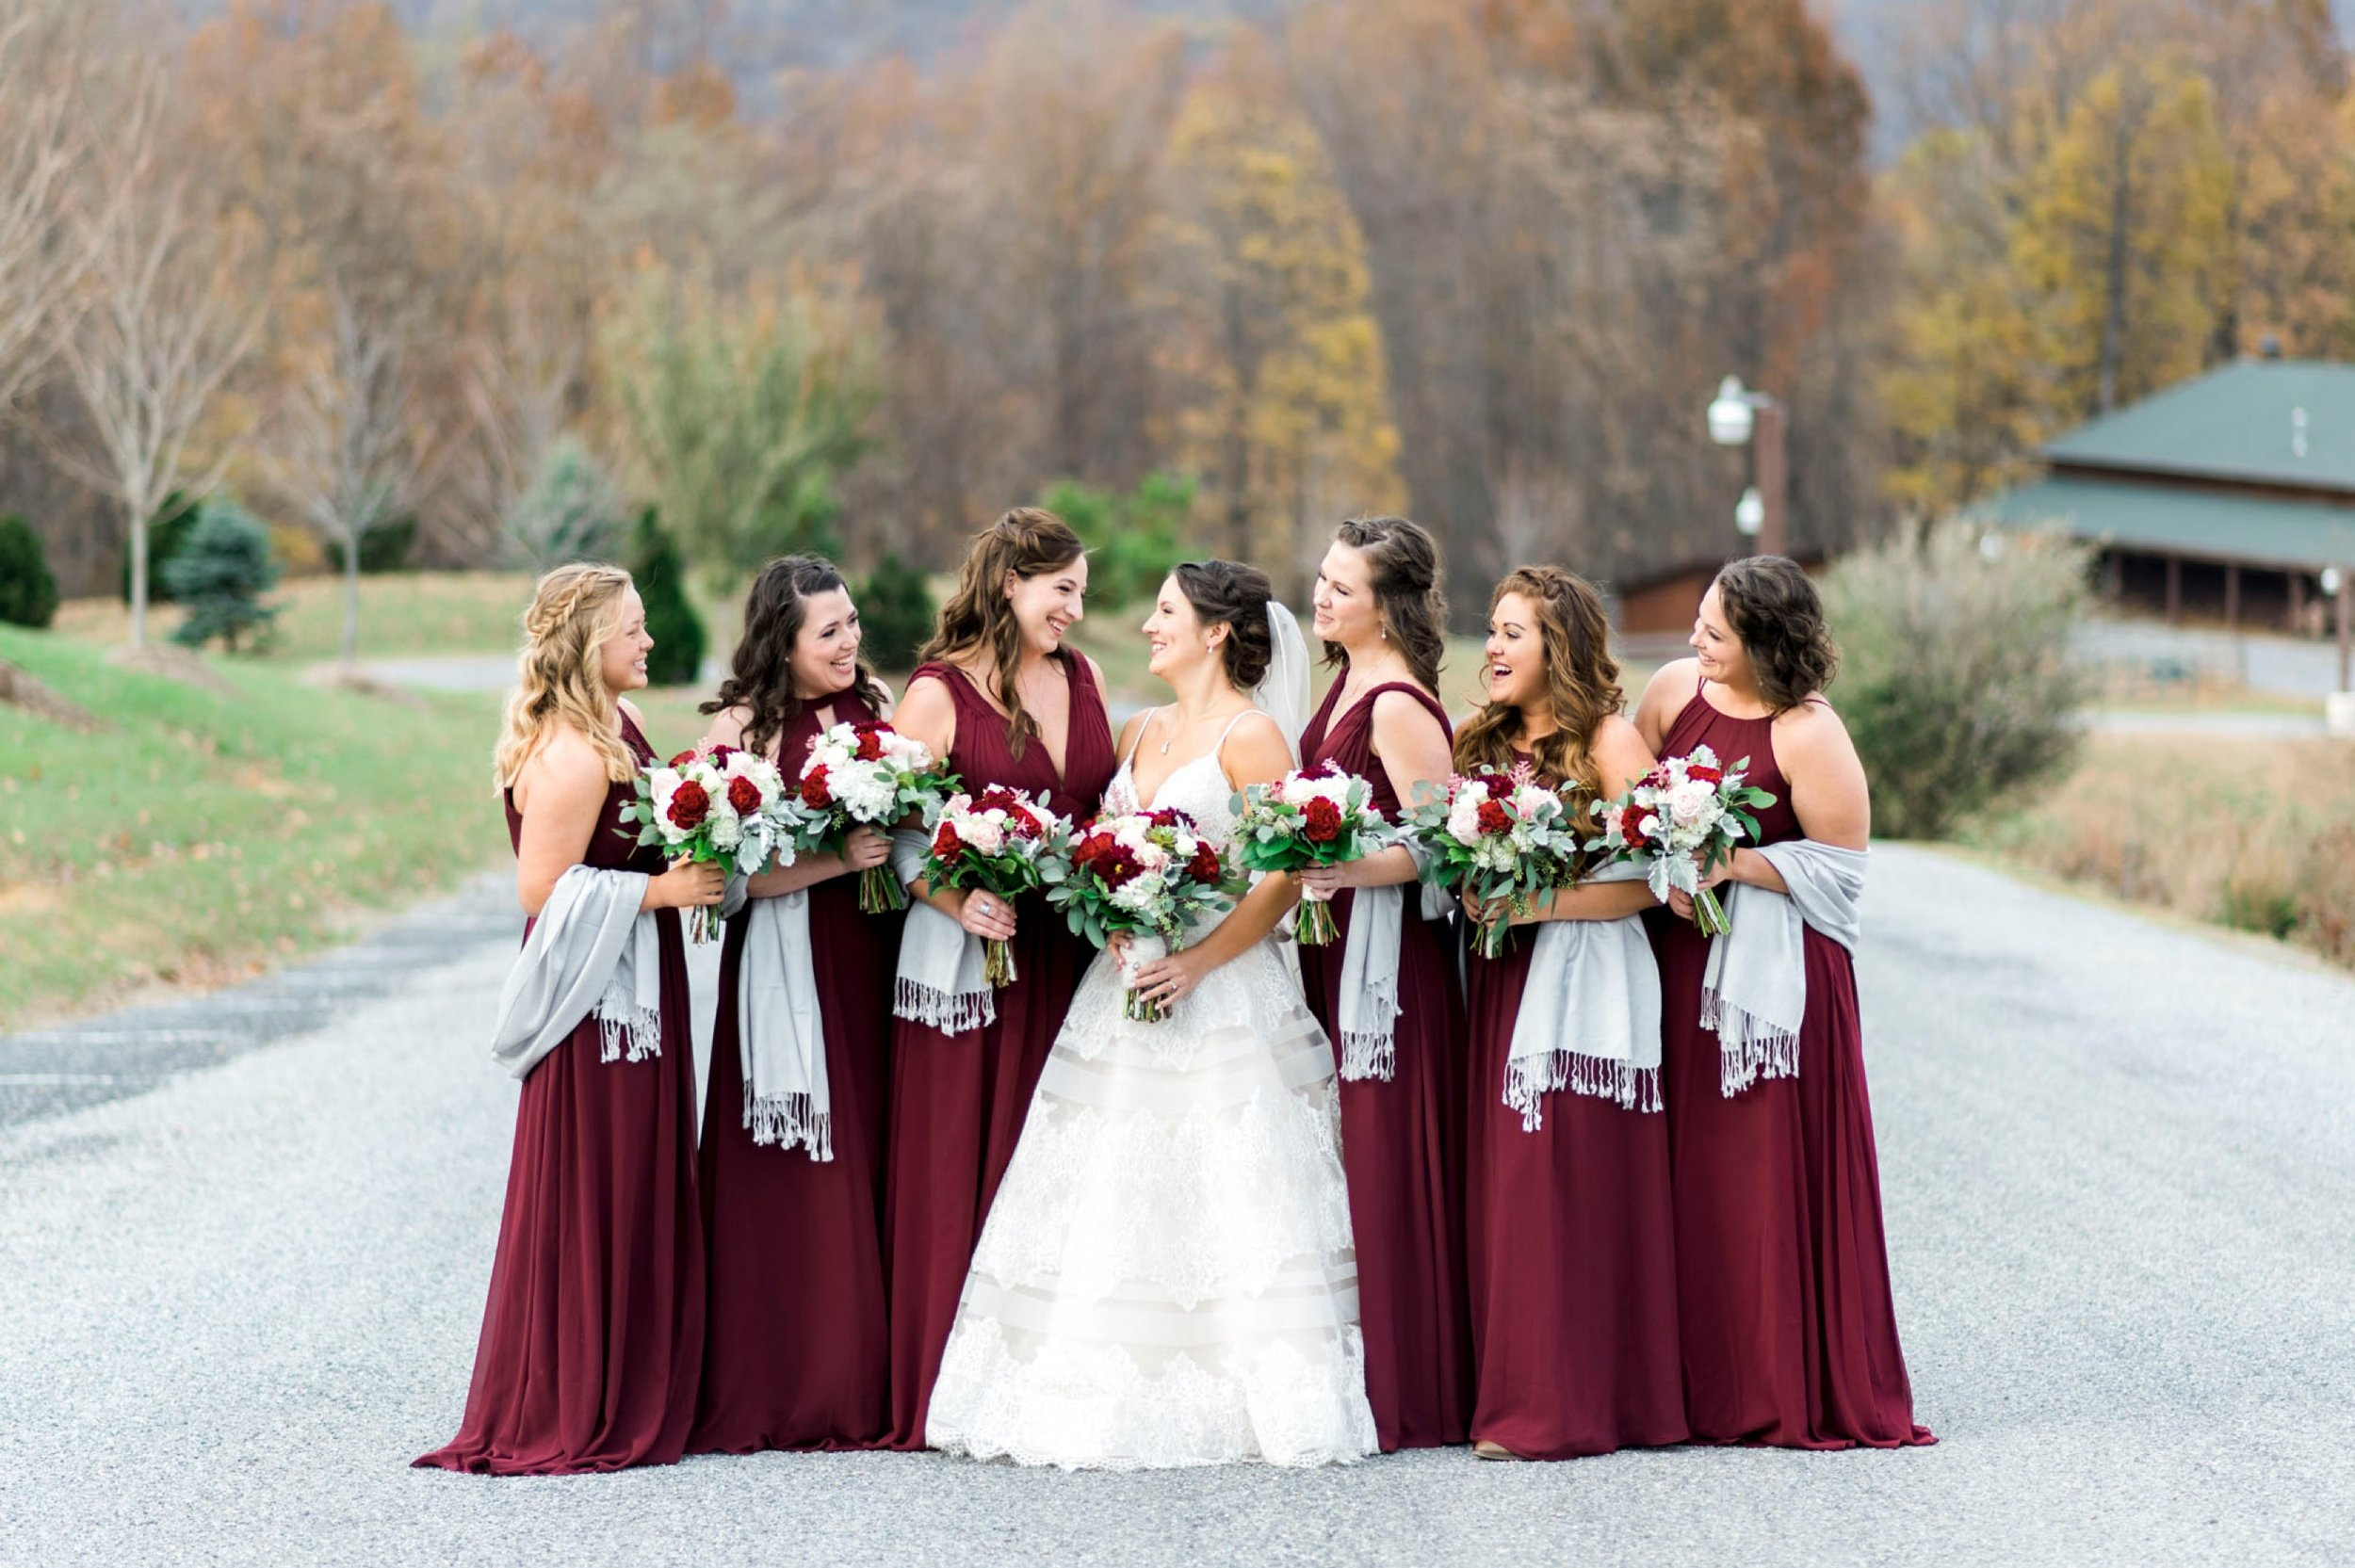 IrvineEstate_LexingtonVA_Wedding_FallWedding_VirginiaWeddingPhotographer 41.jpg